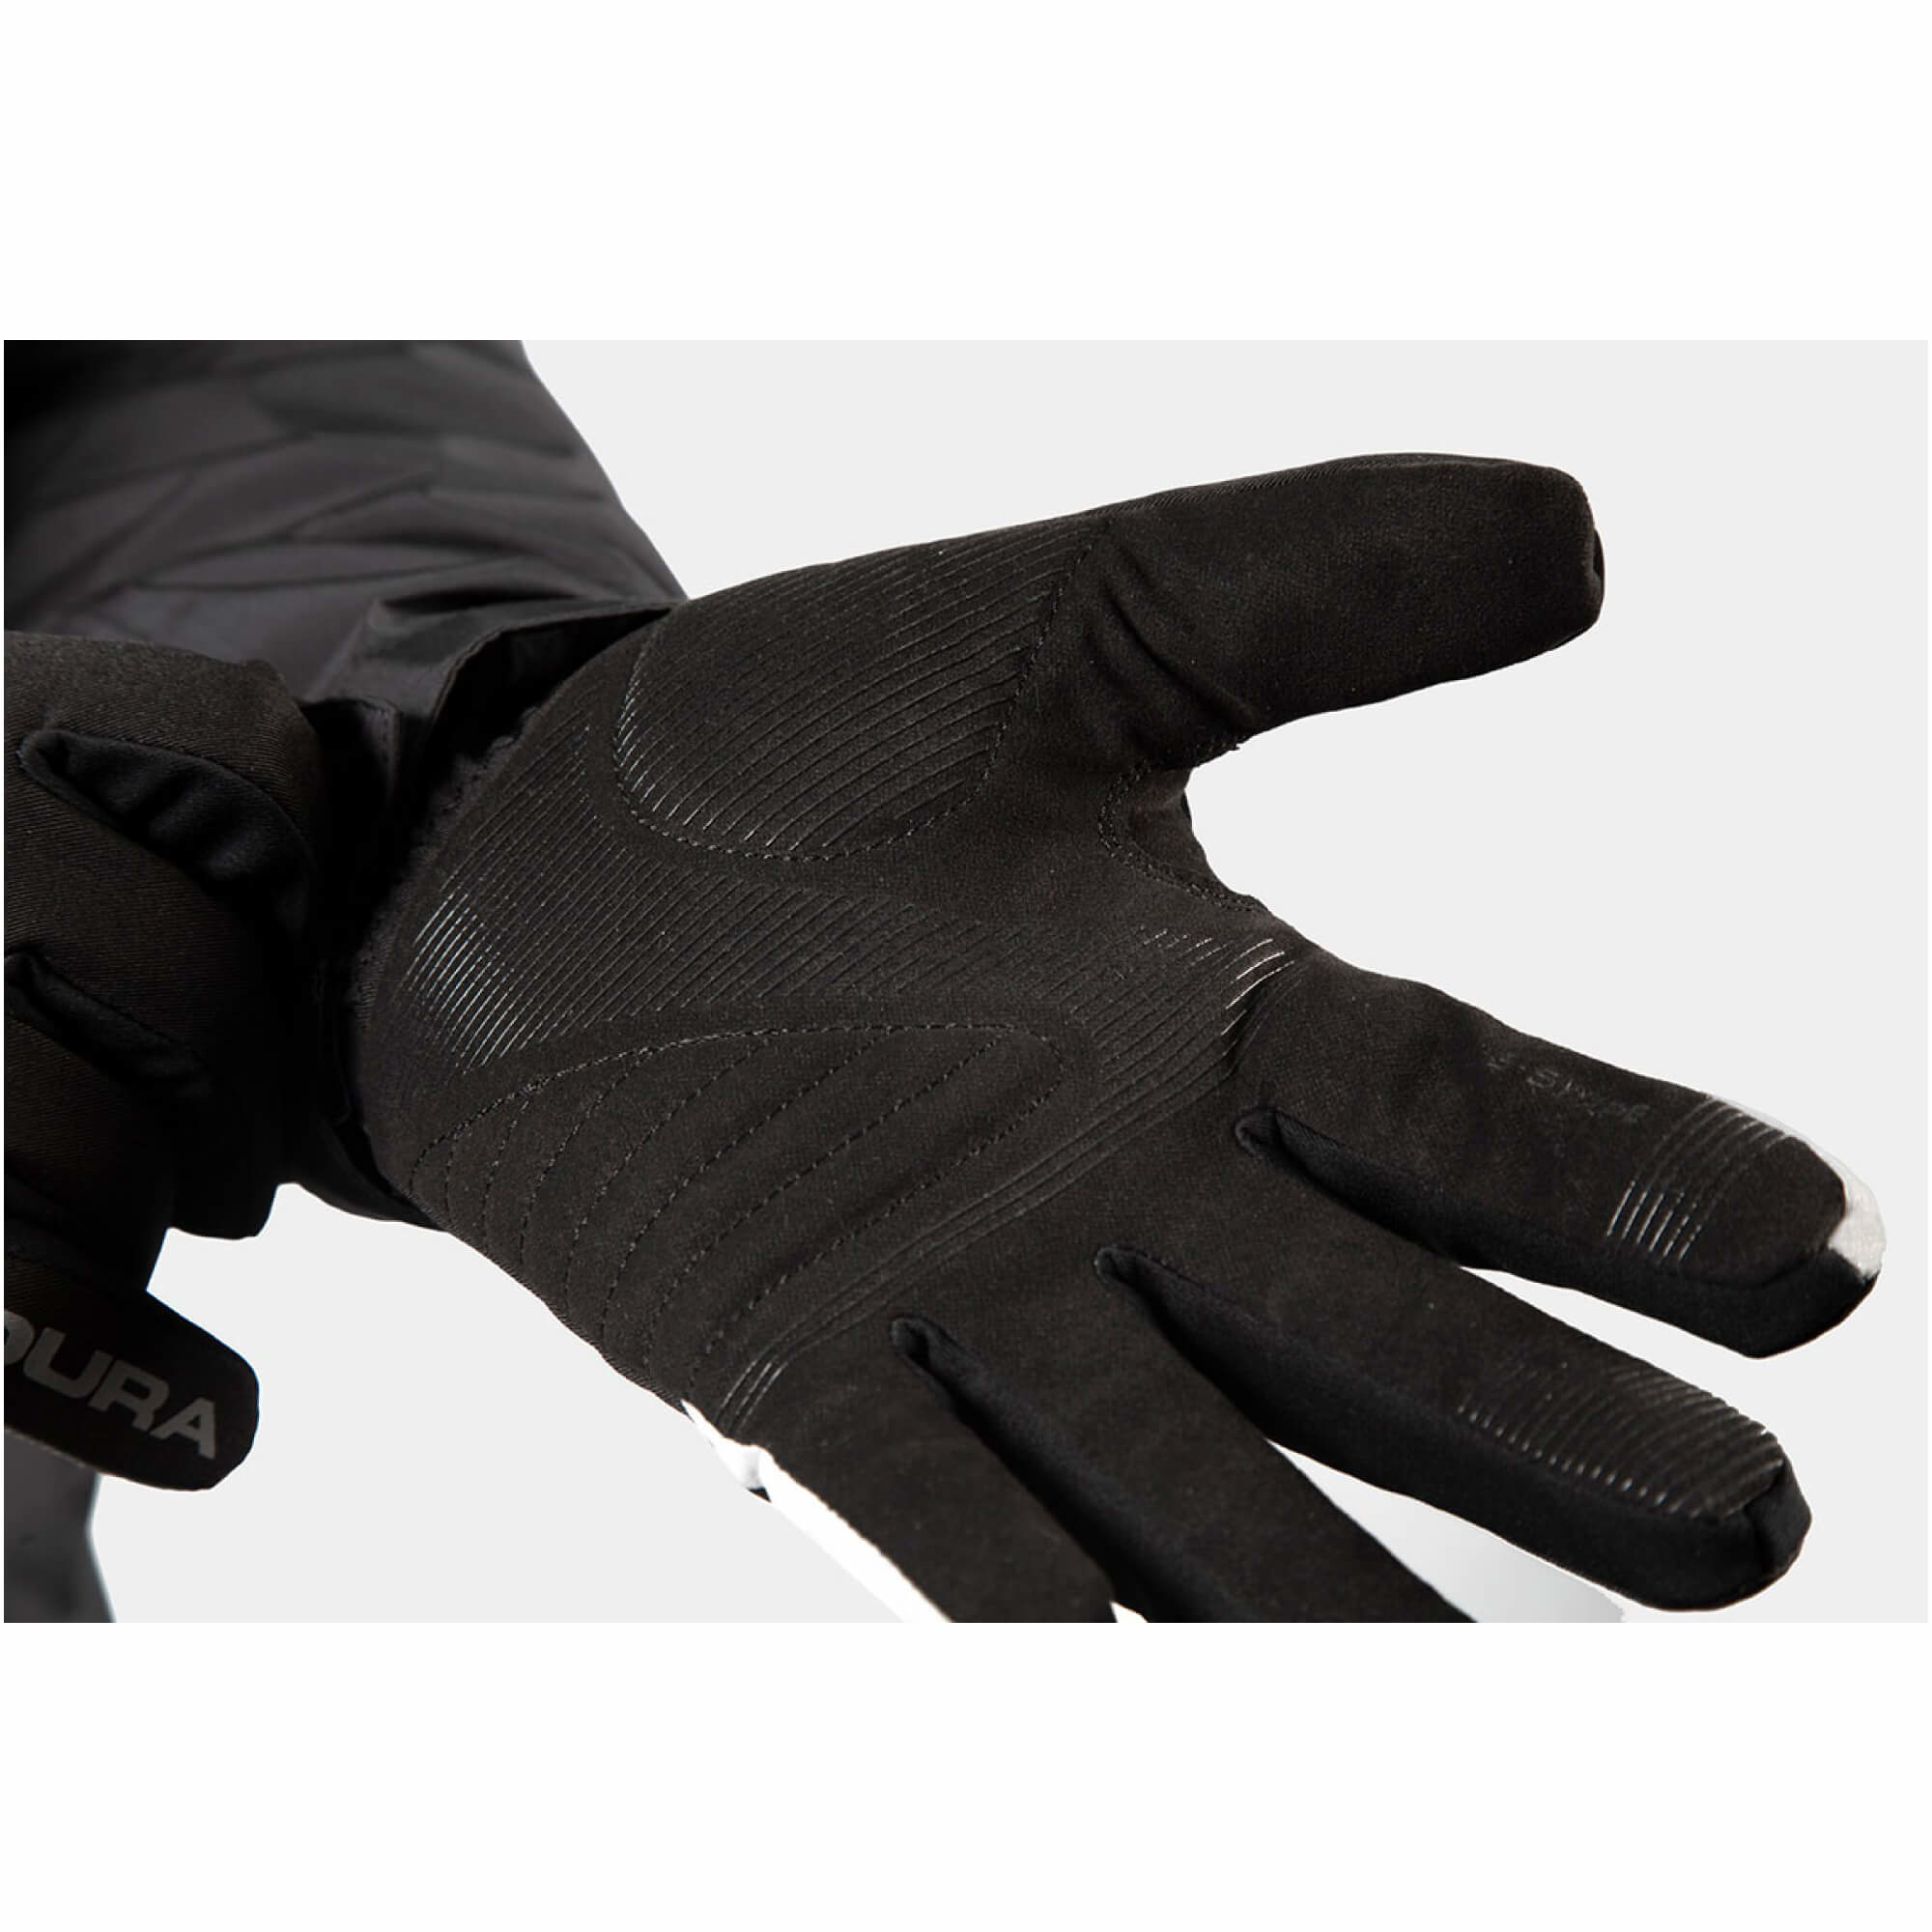 Deluge Glove-3